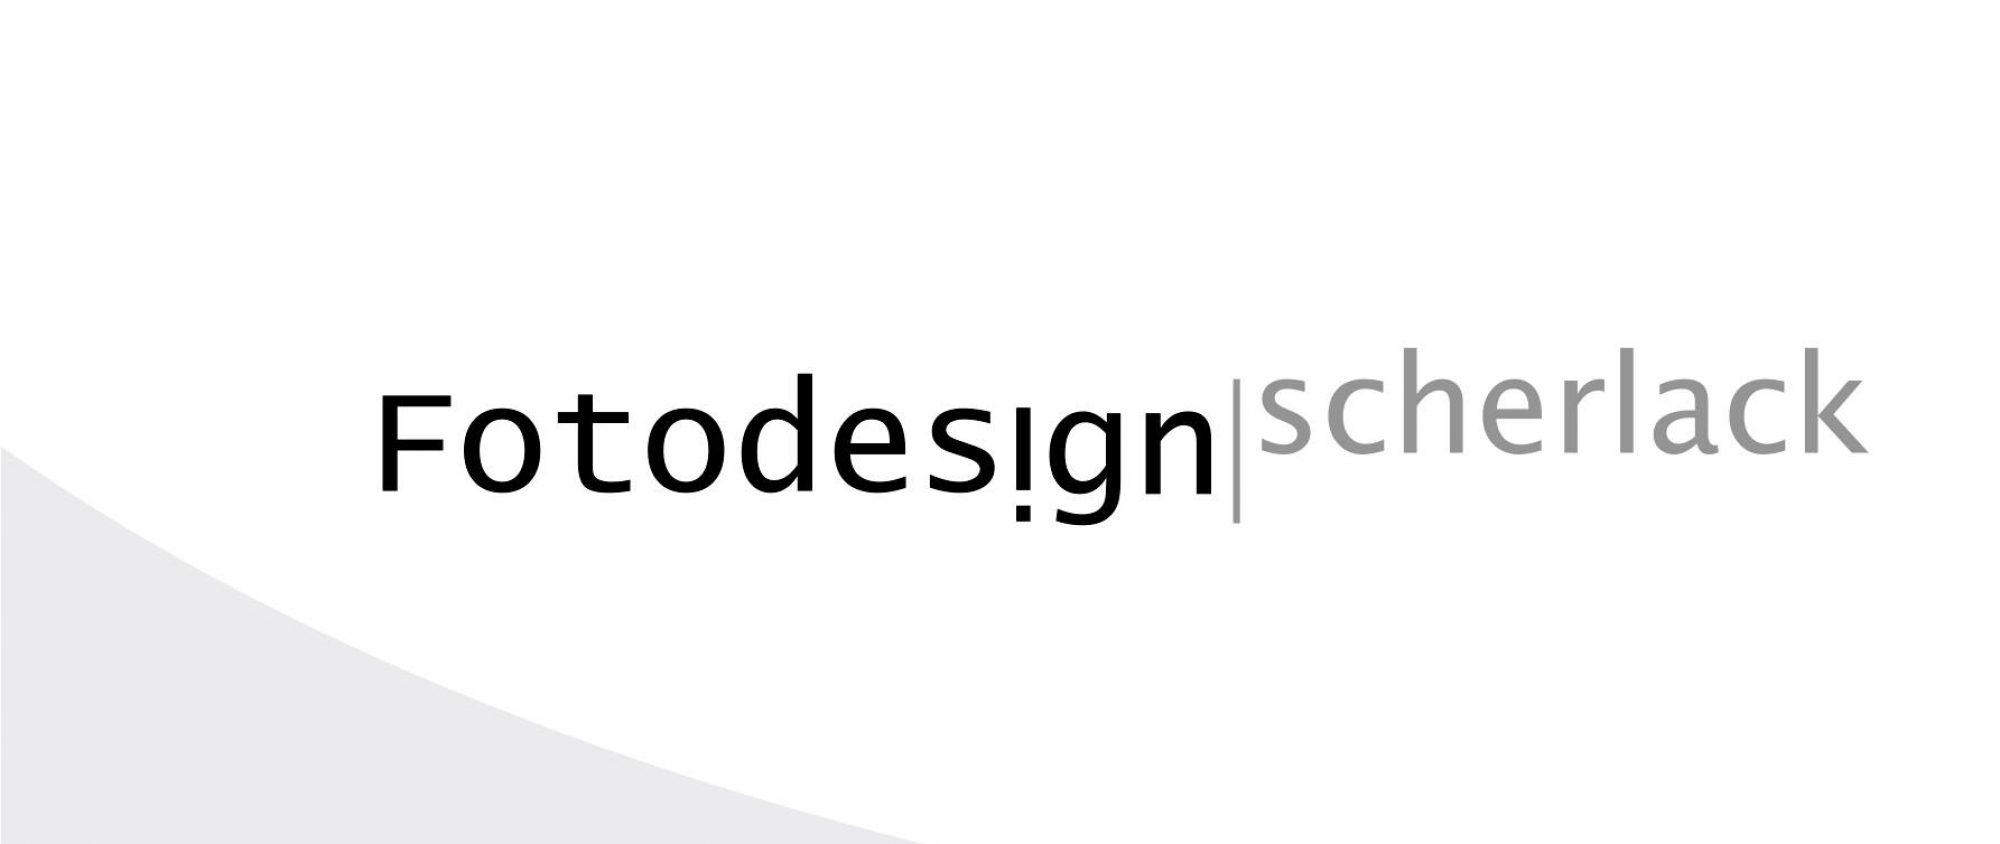 Fotodesign Scherlack Weblog